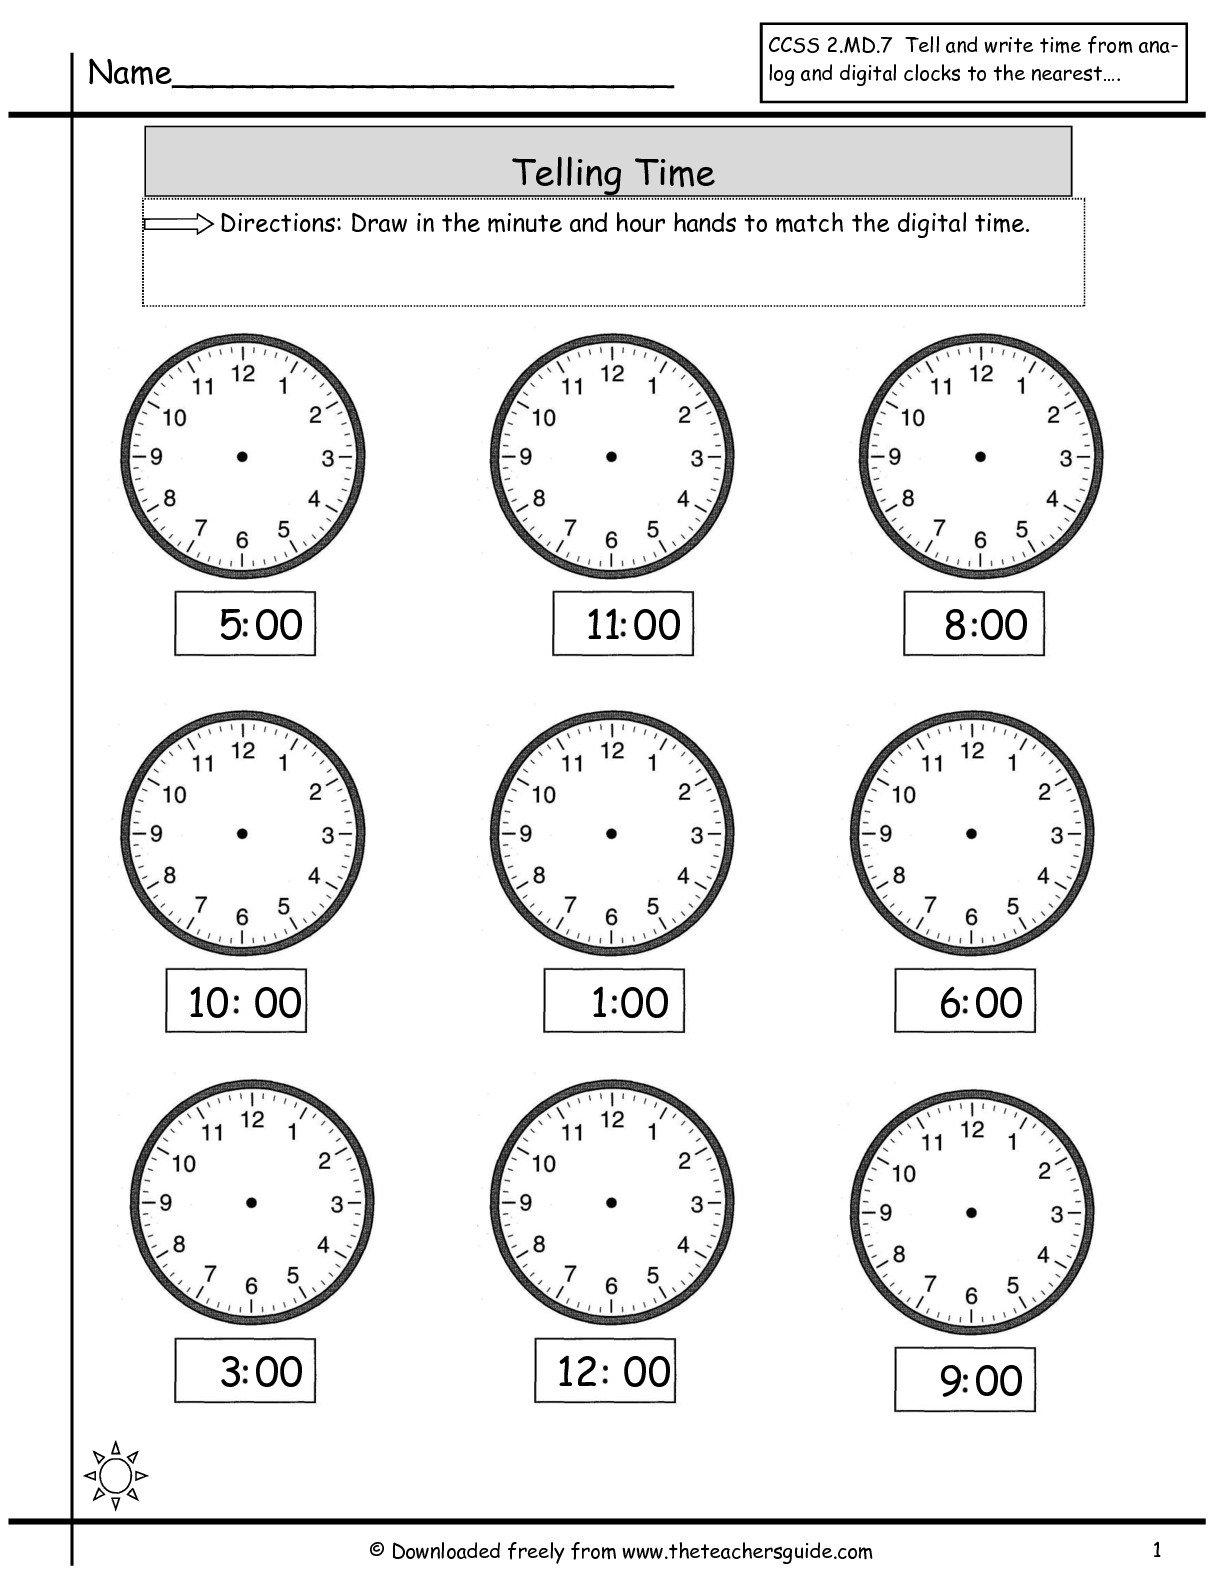 Telling Time Worksheets Online Games The Best Worksheets Image